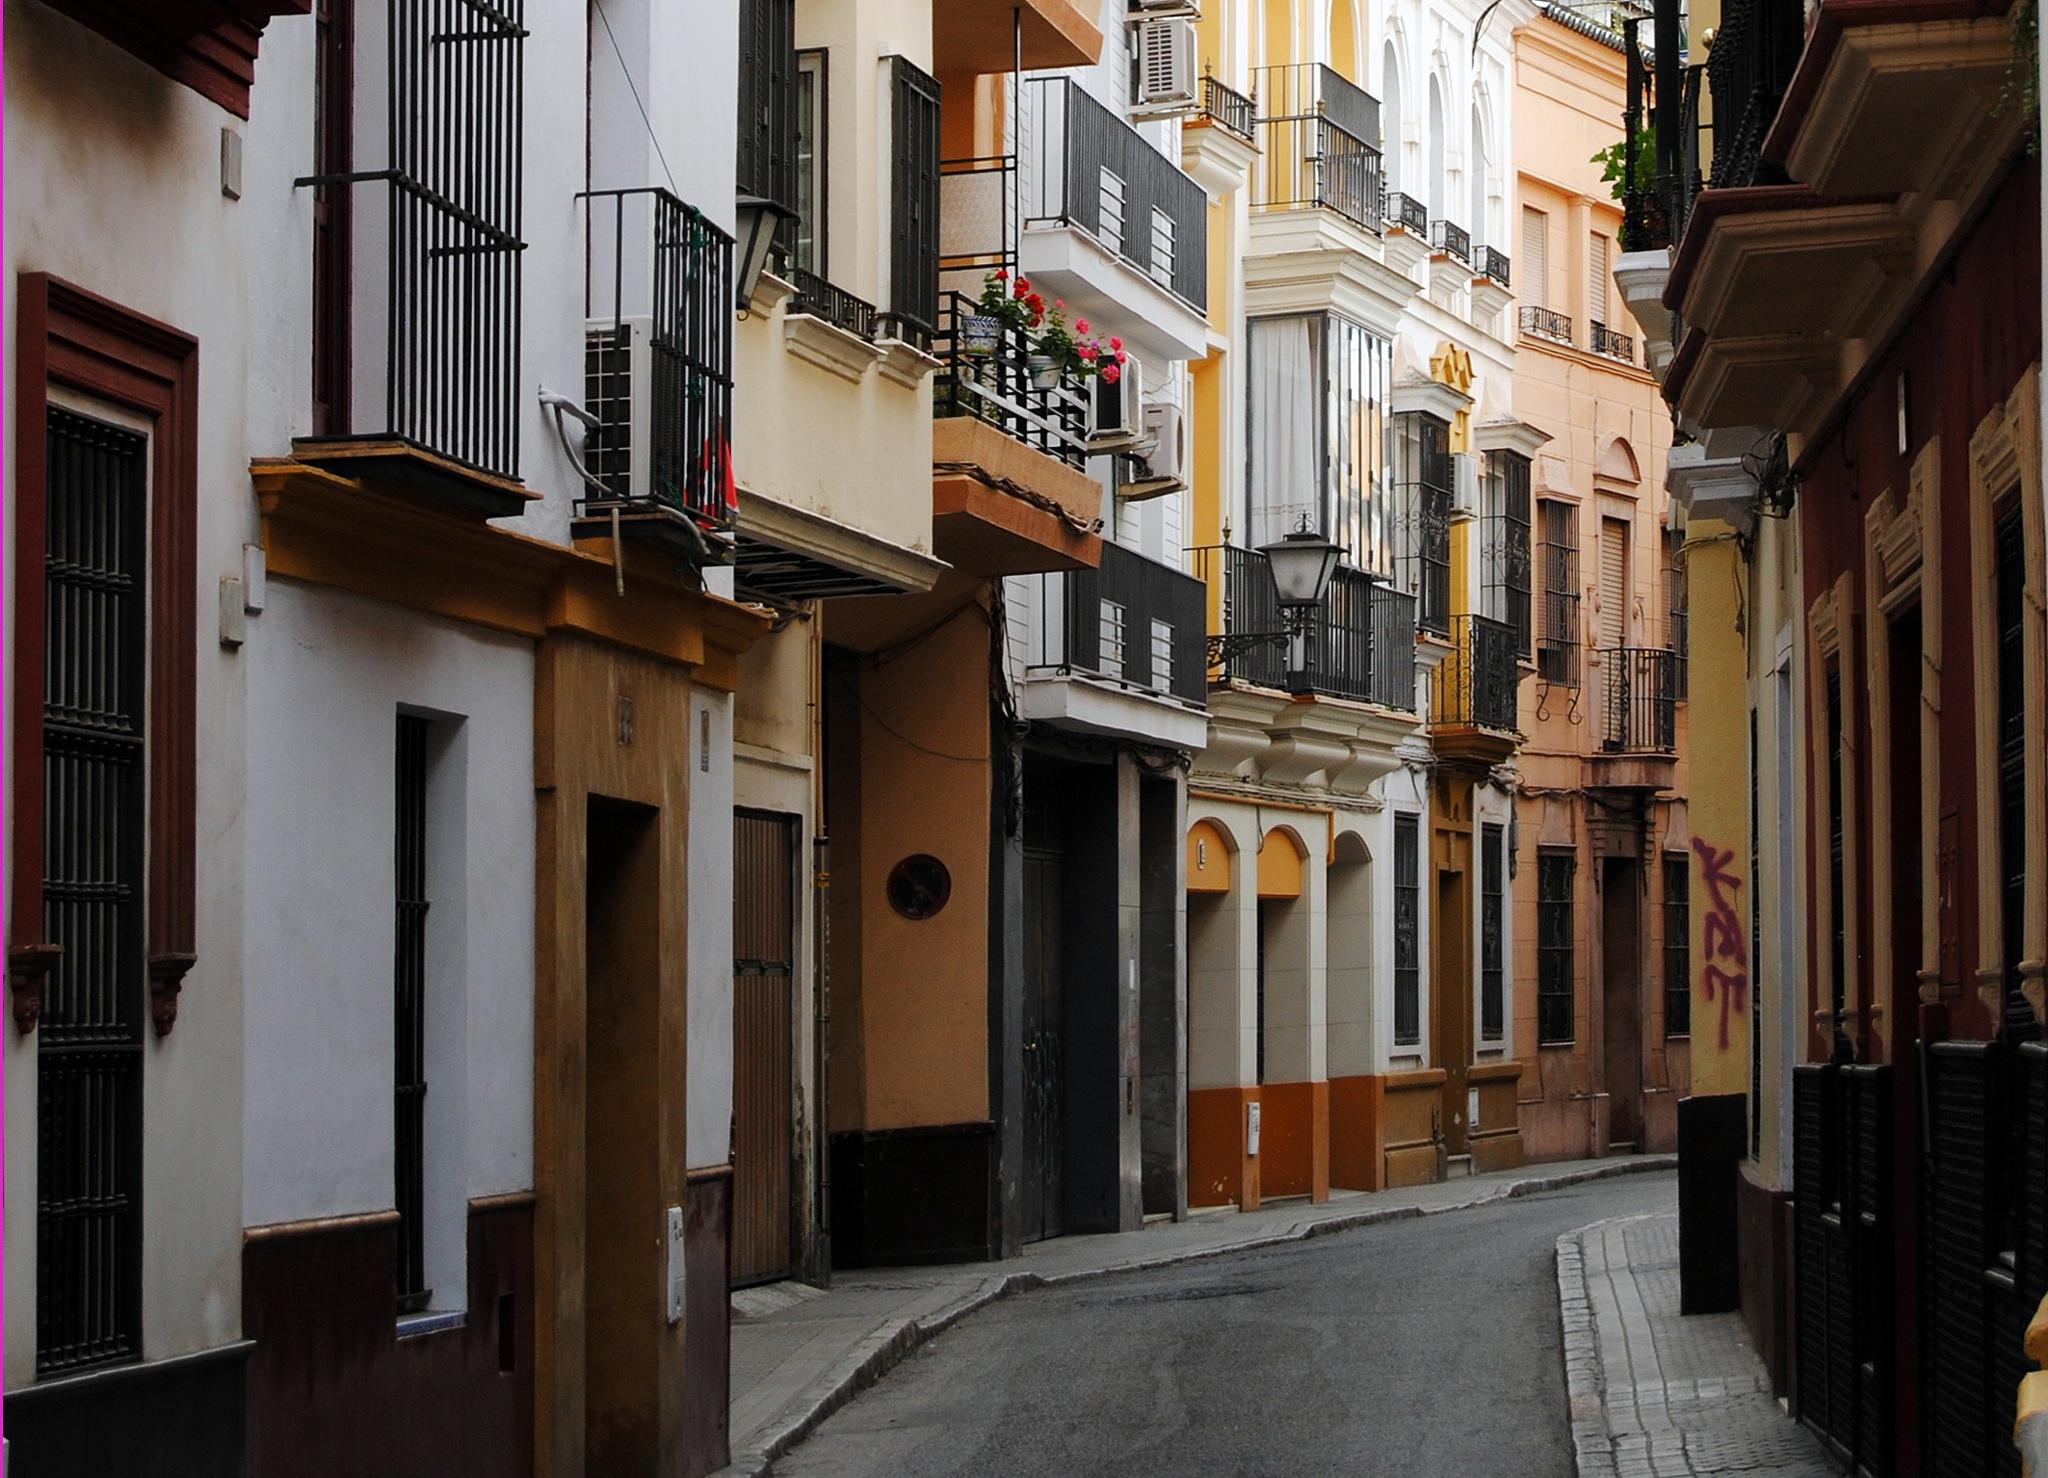 Calle Santiago. Sevilla by DavidRoldan